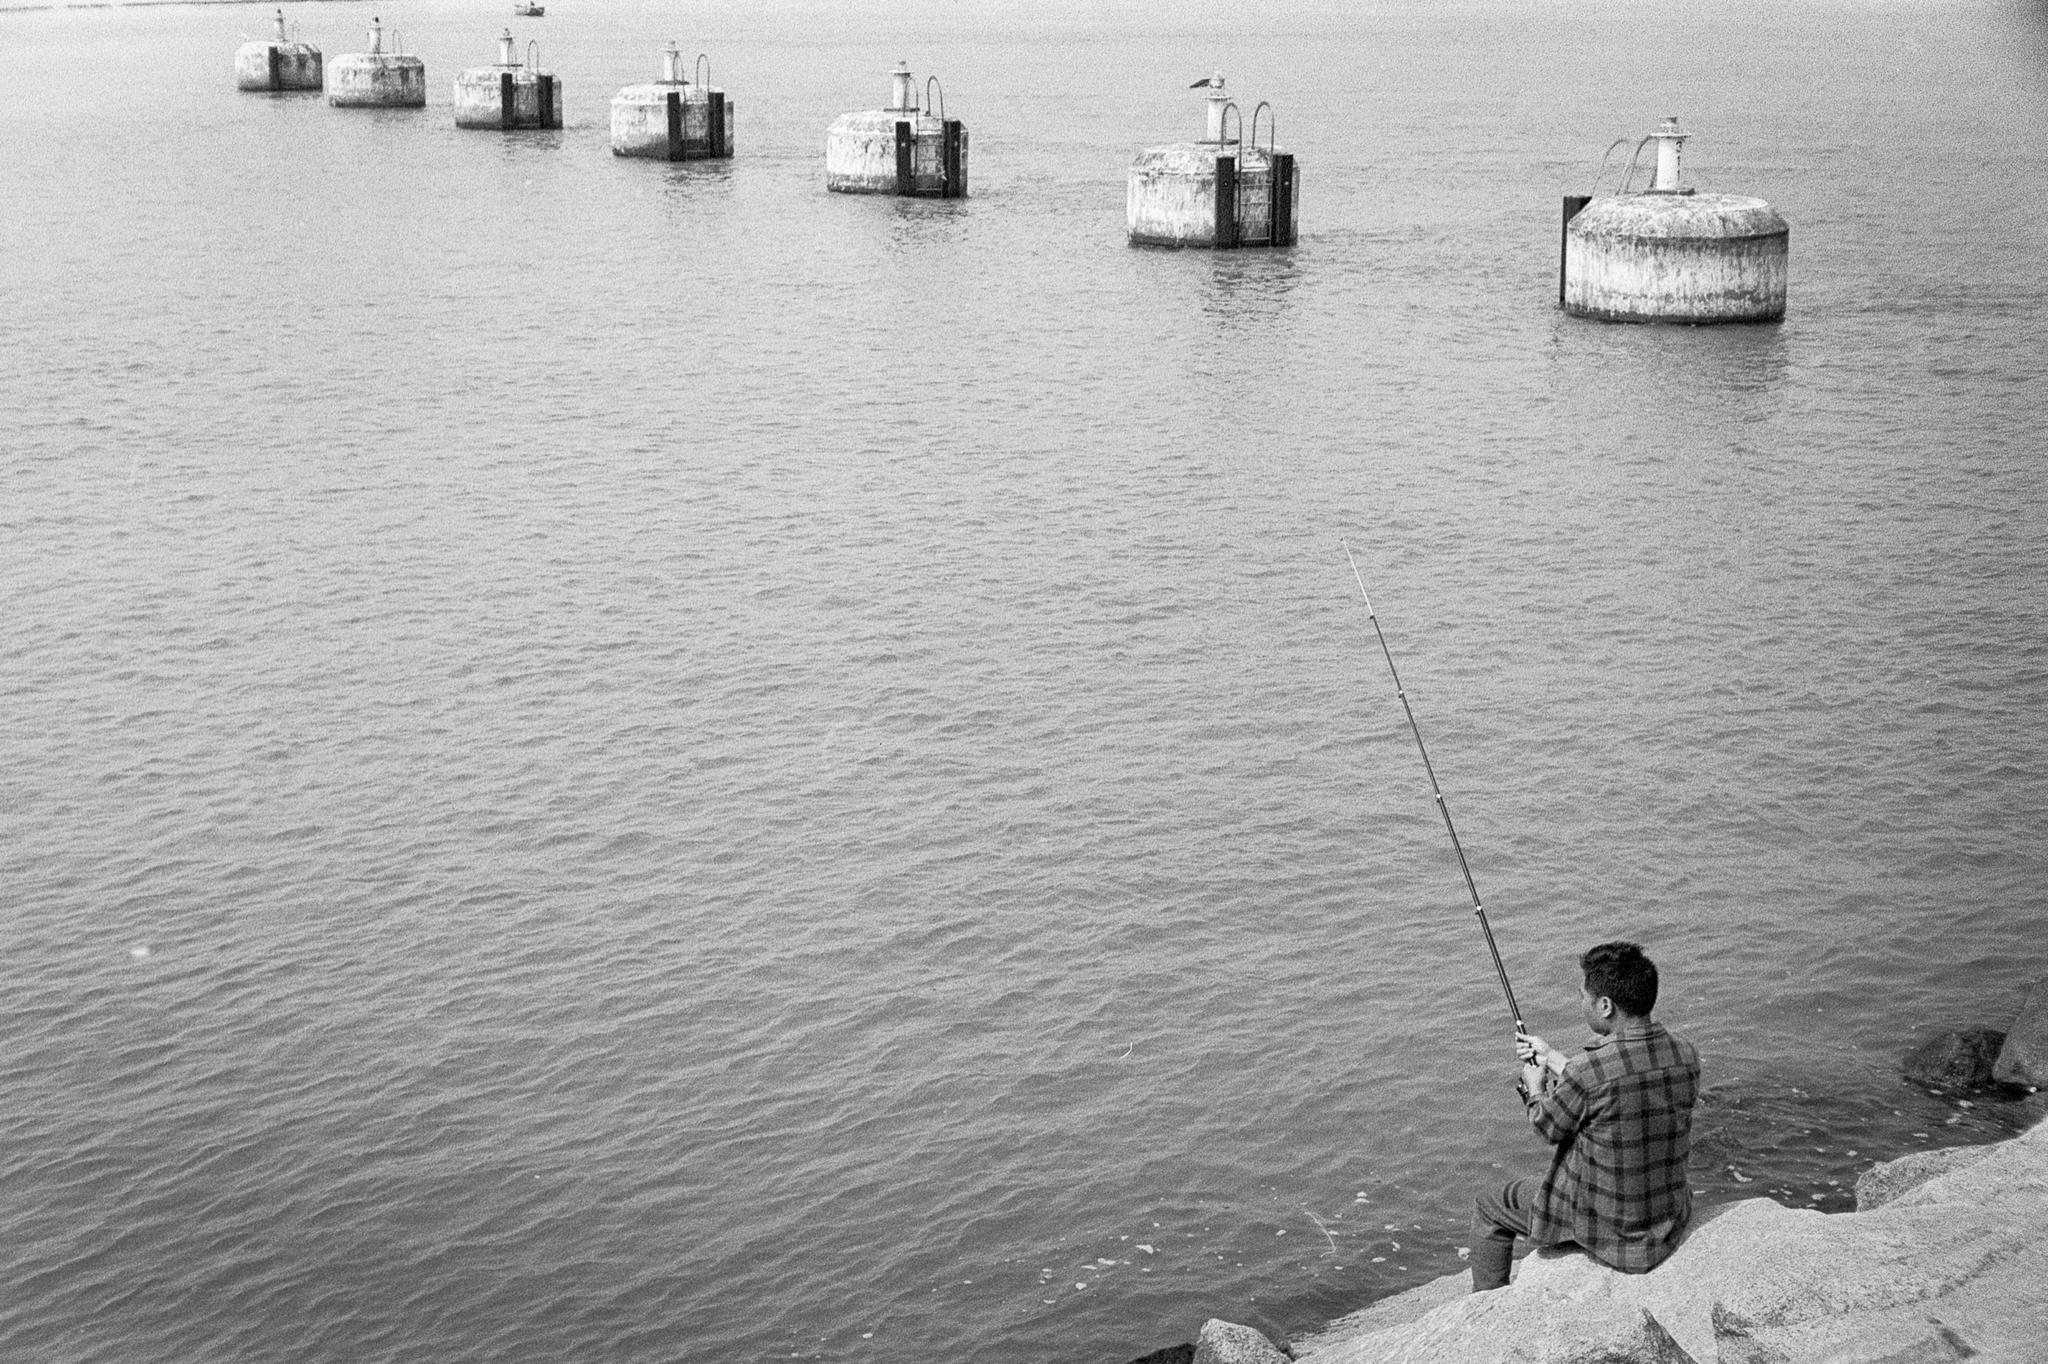 14. Fishing near Tung Chung